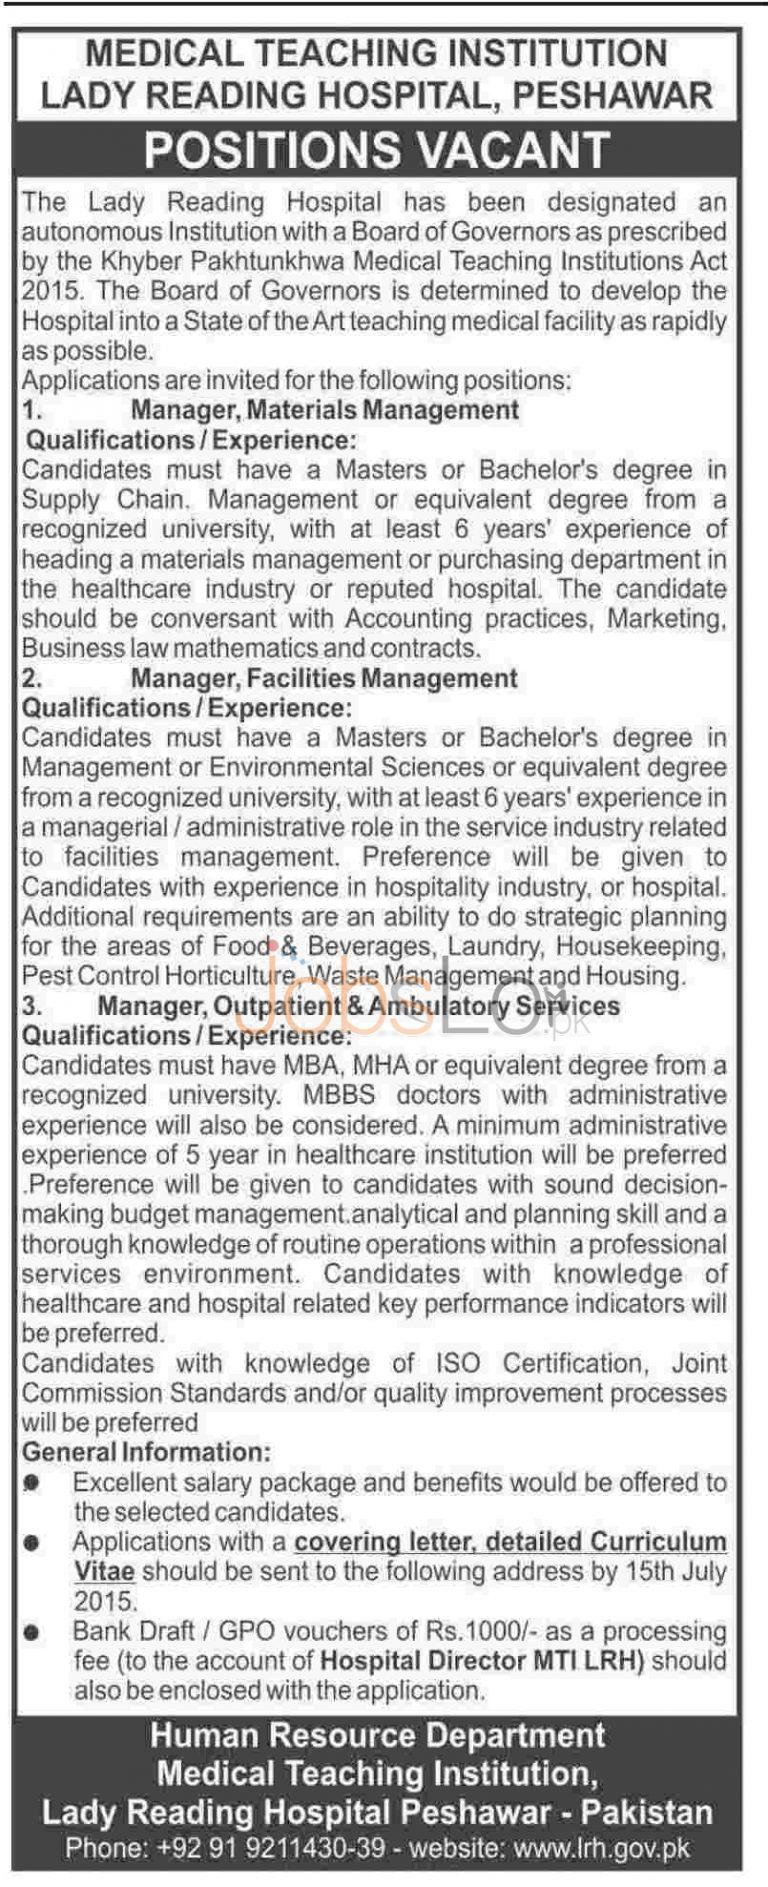 Lady Reading Hospital Peshawar Jobs 2015 June 30 Advertisement